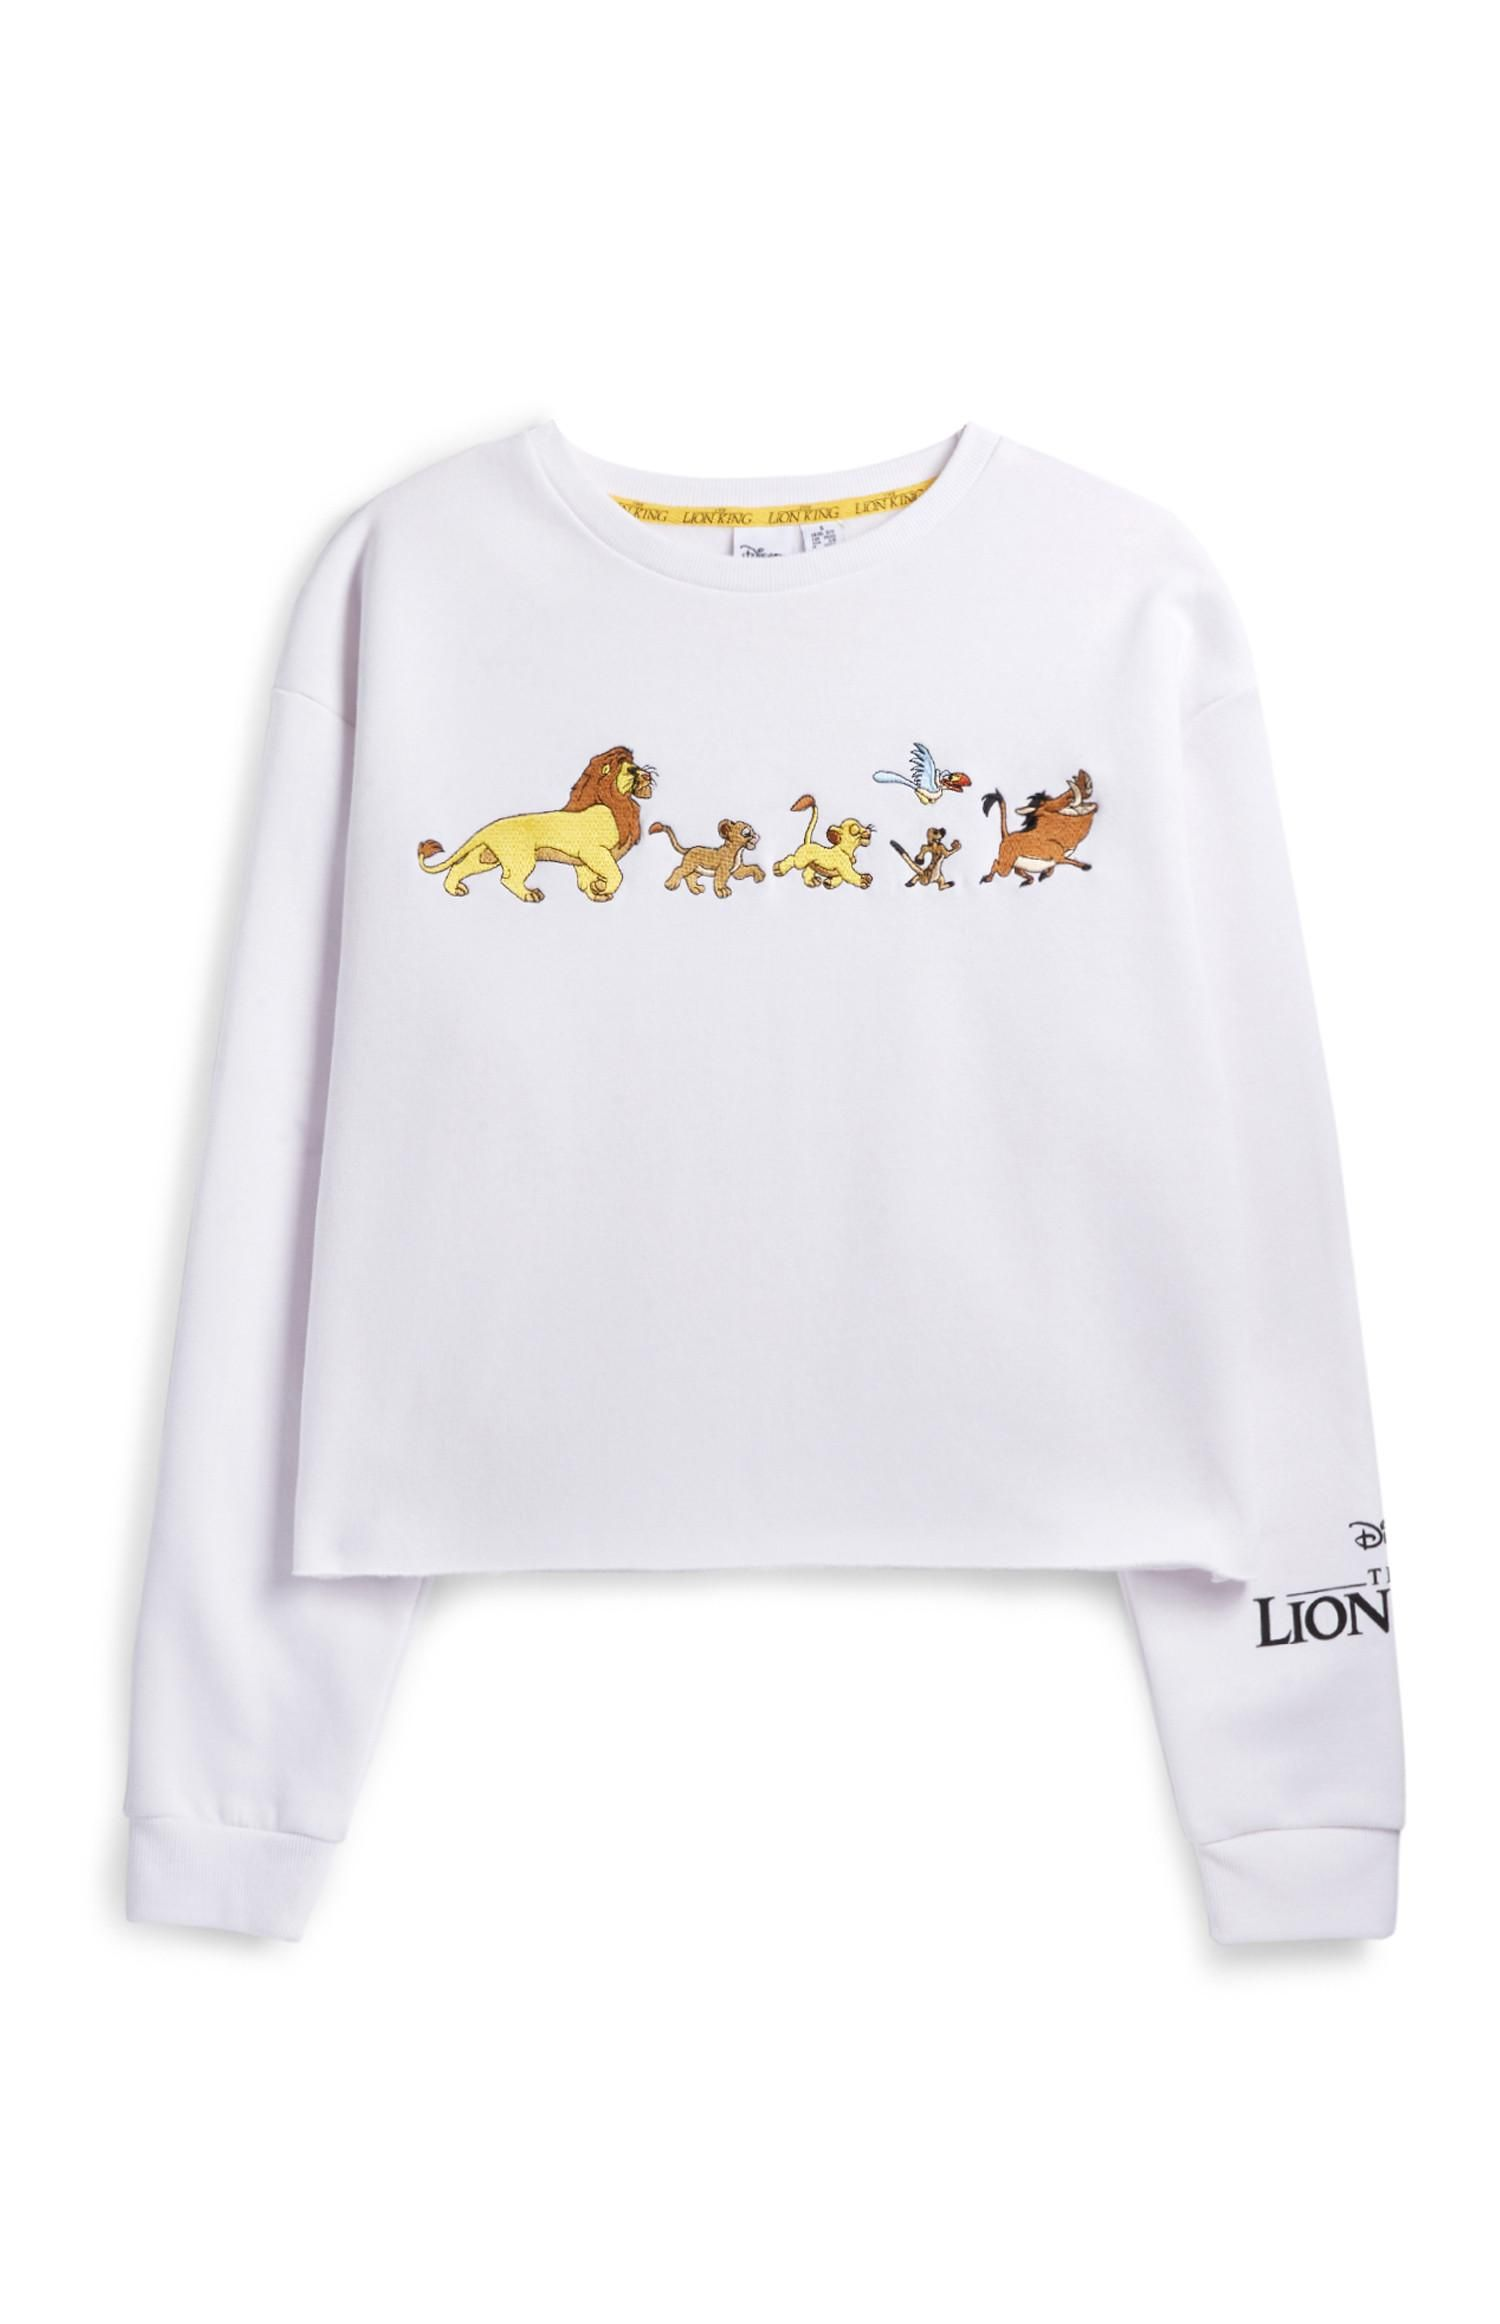 Primark Lion King Cropped Jumper Camisetas Da Disney Roupas Divertidas Roupas Da Disney [ 2324 x 1500 Pixel ]